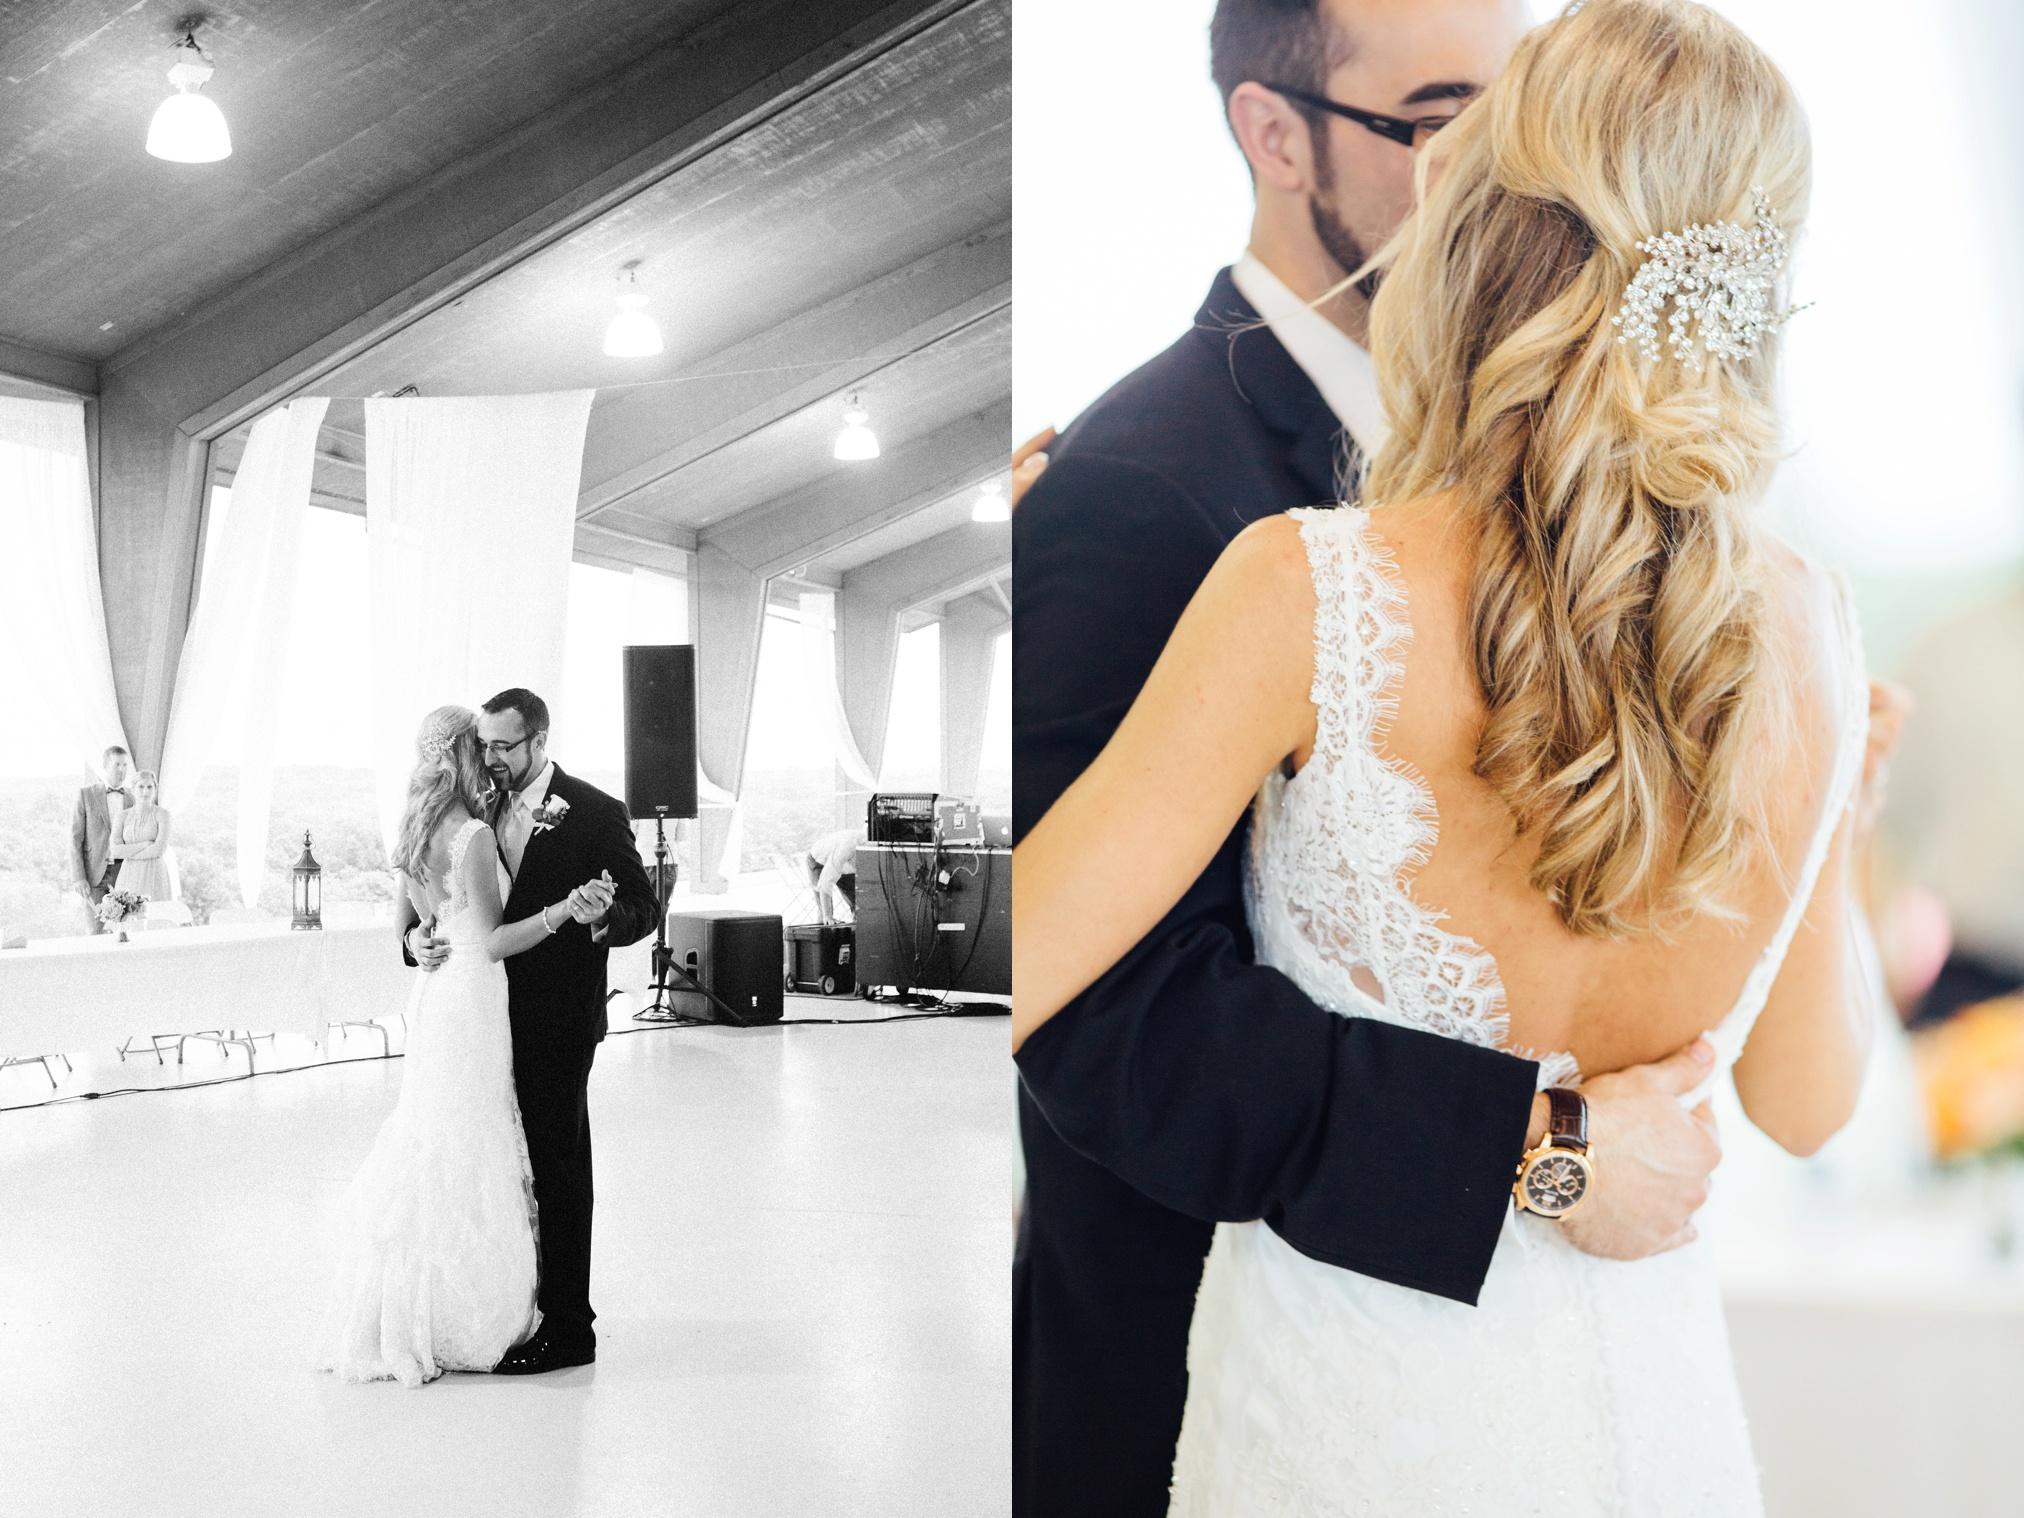 schmid_wedding-761.jpg